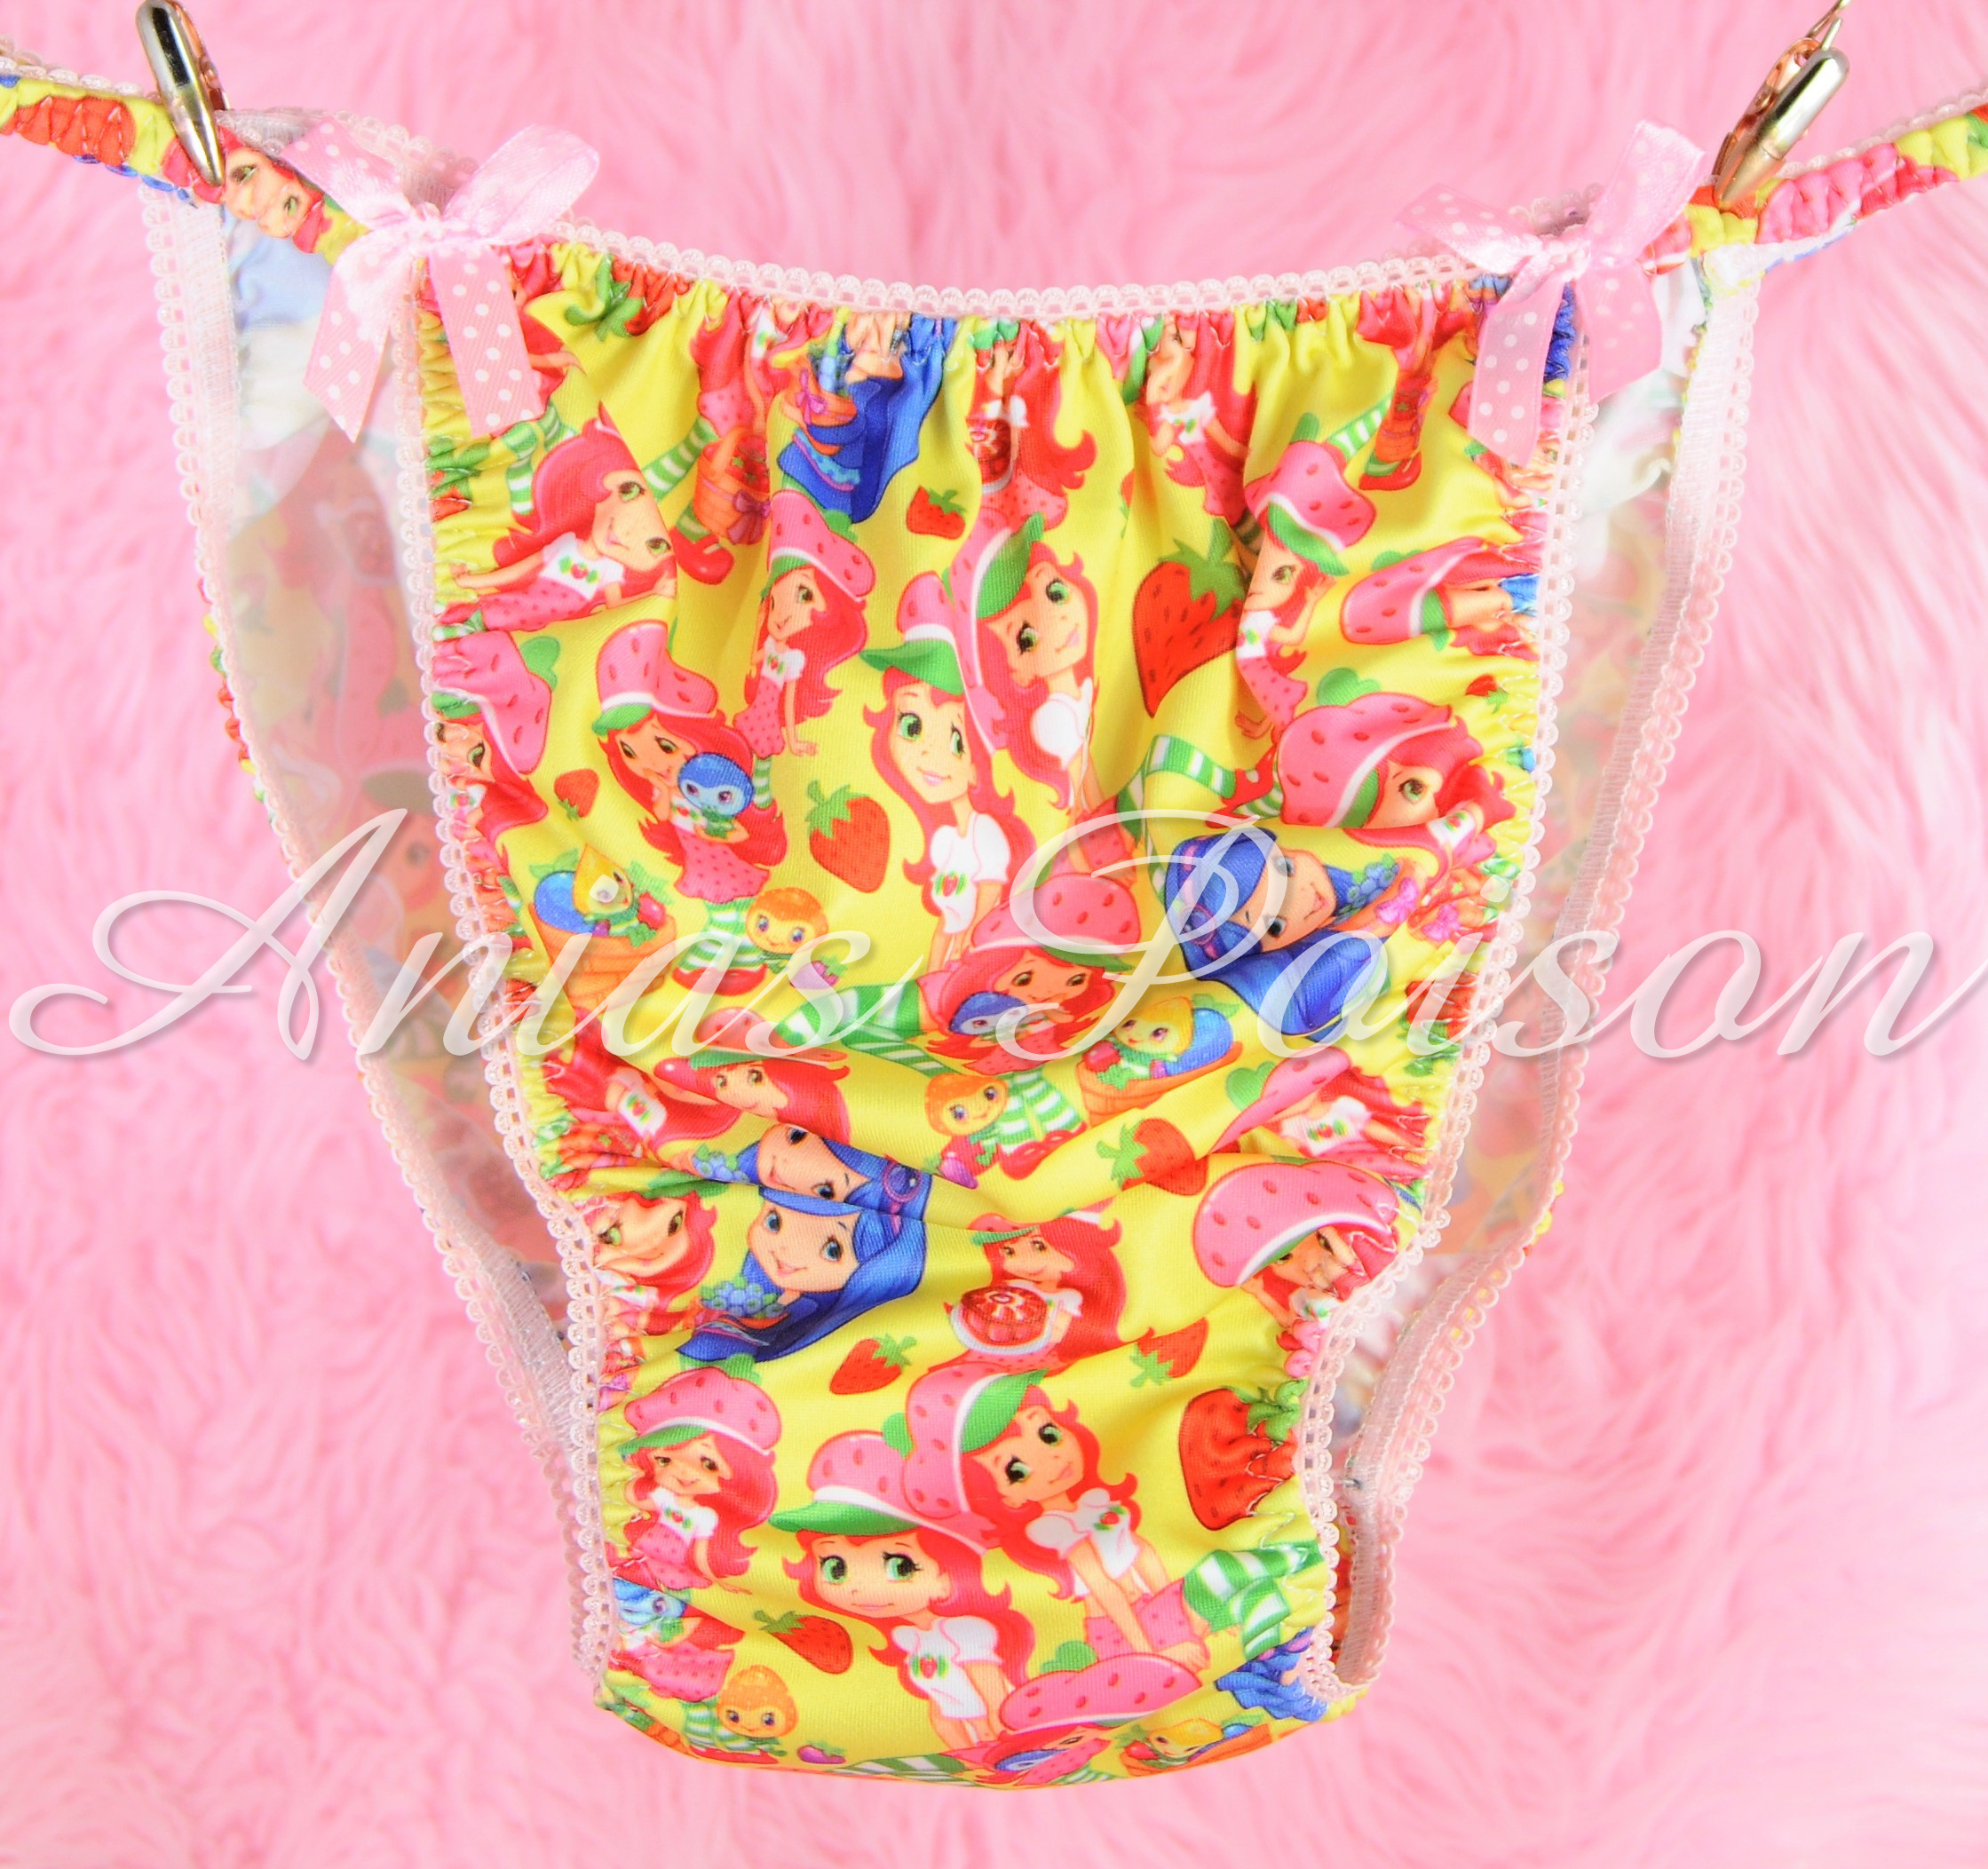 Rare Novelty Character print Spandex Stretch string bikini Strawberry Shortcake Princess Panties 00219